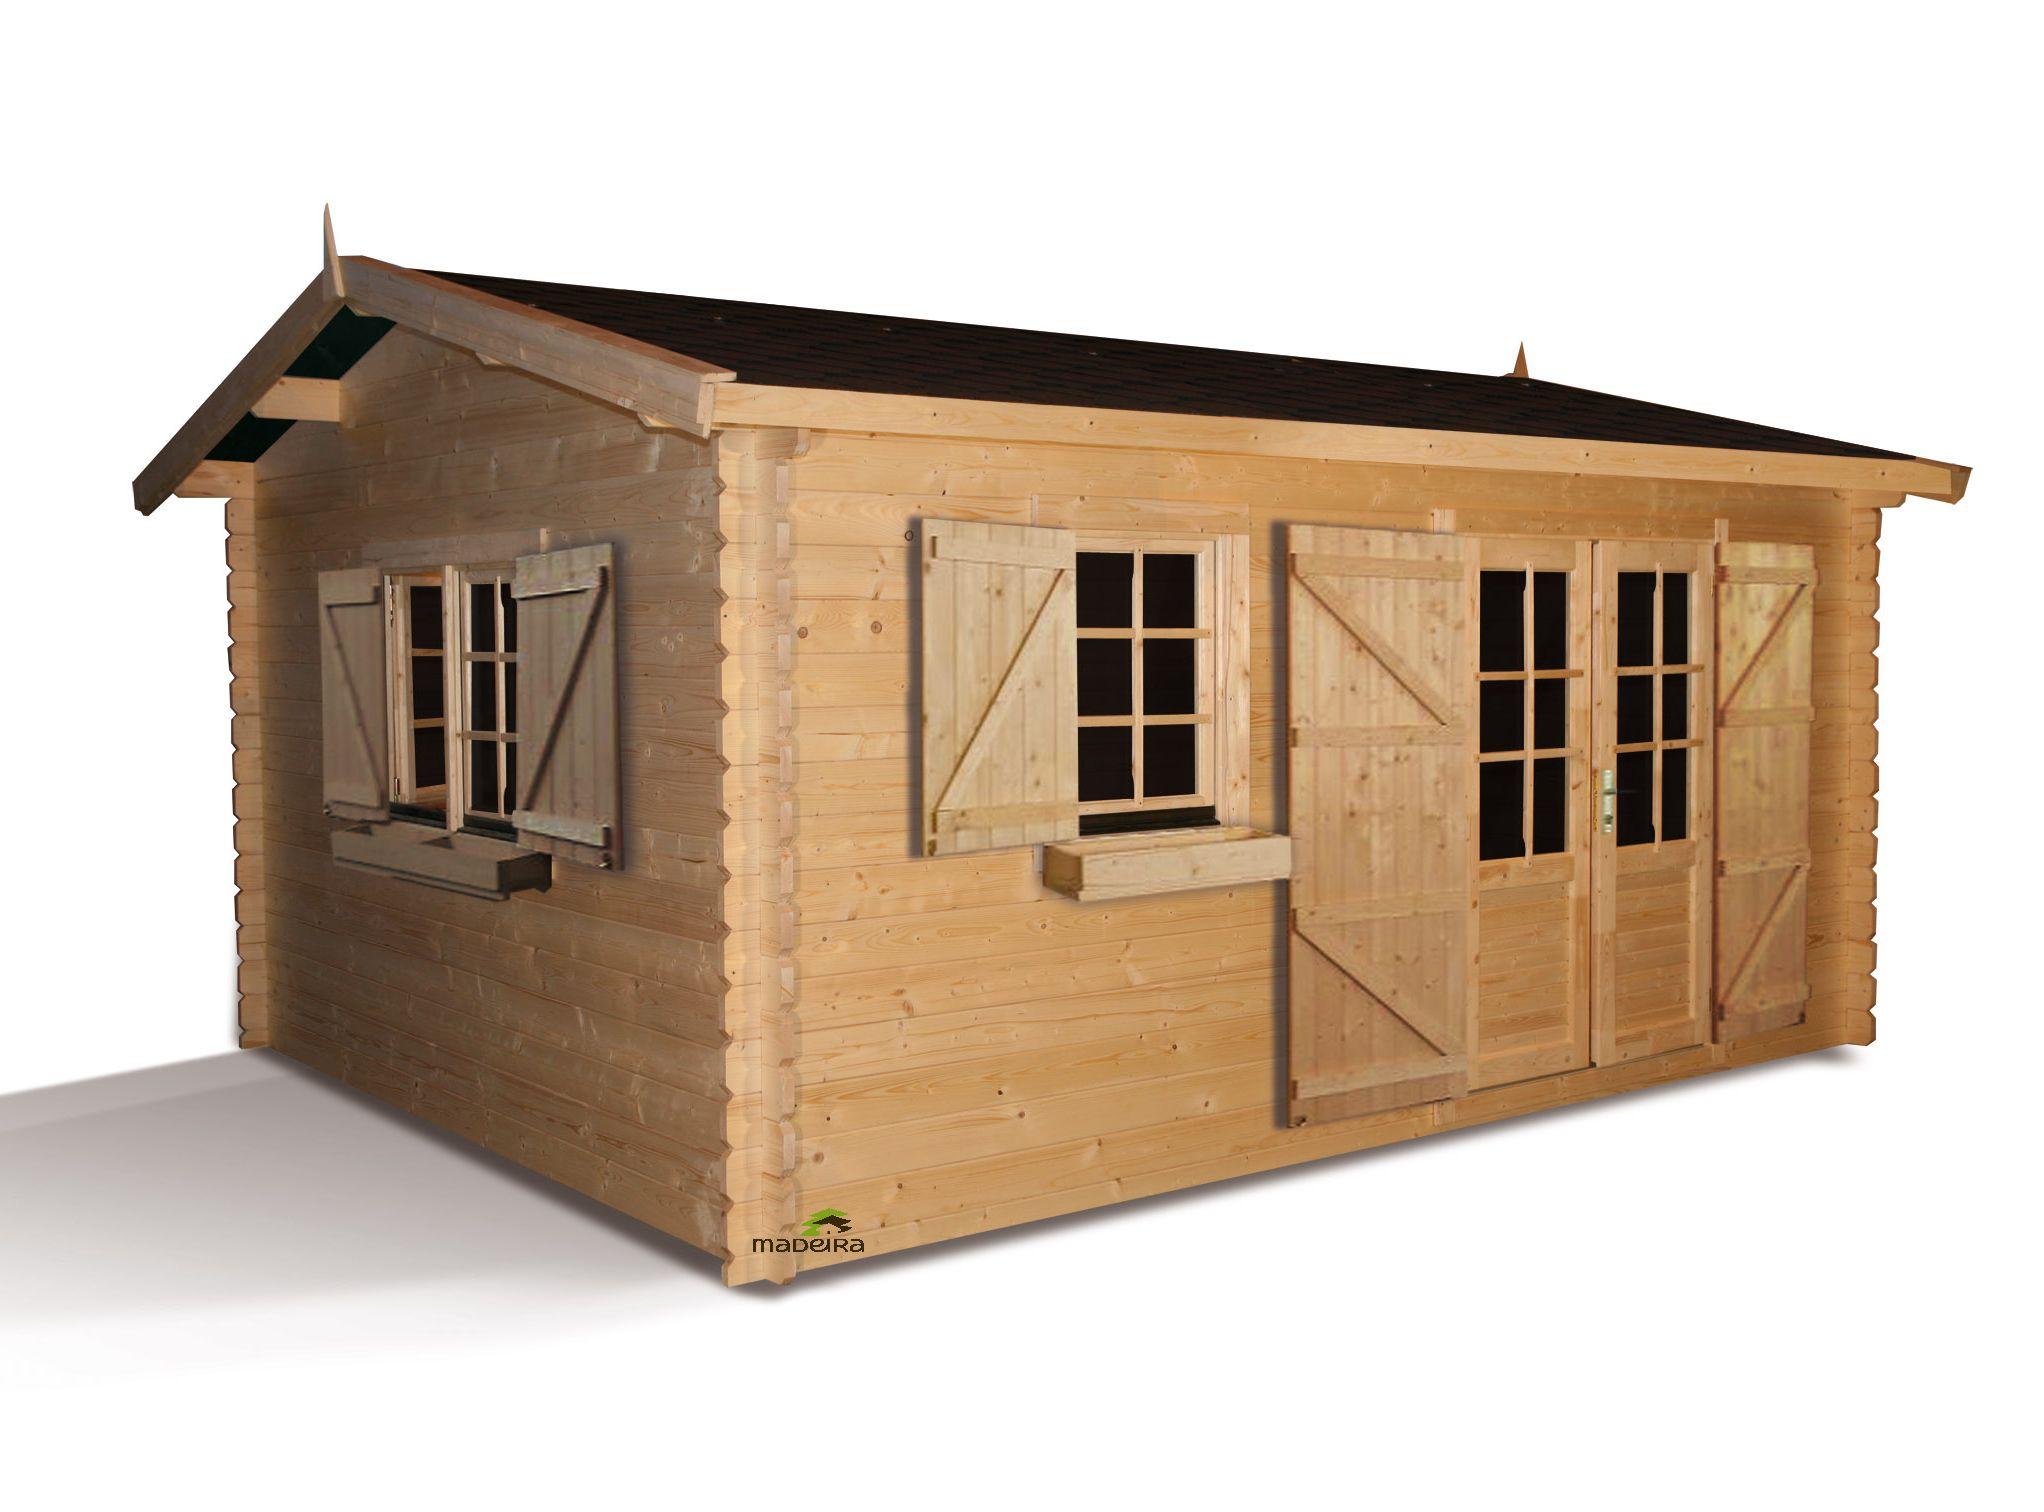 abri bois plan cool plan de garage en bois plan de travail bois massif brico depot lgant brico. Black Bedroom Furniture Sets. Home Design Ideas